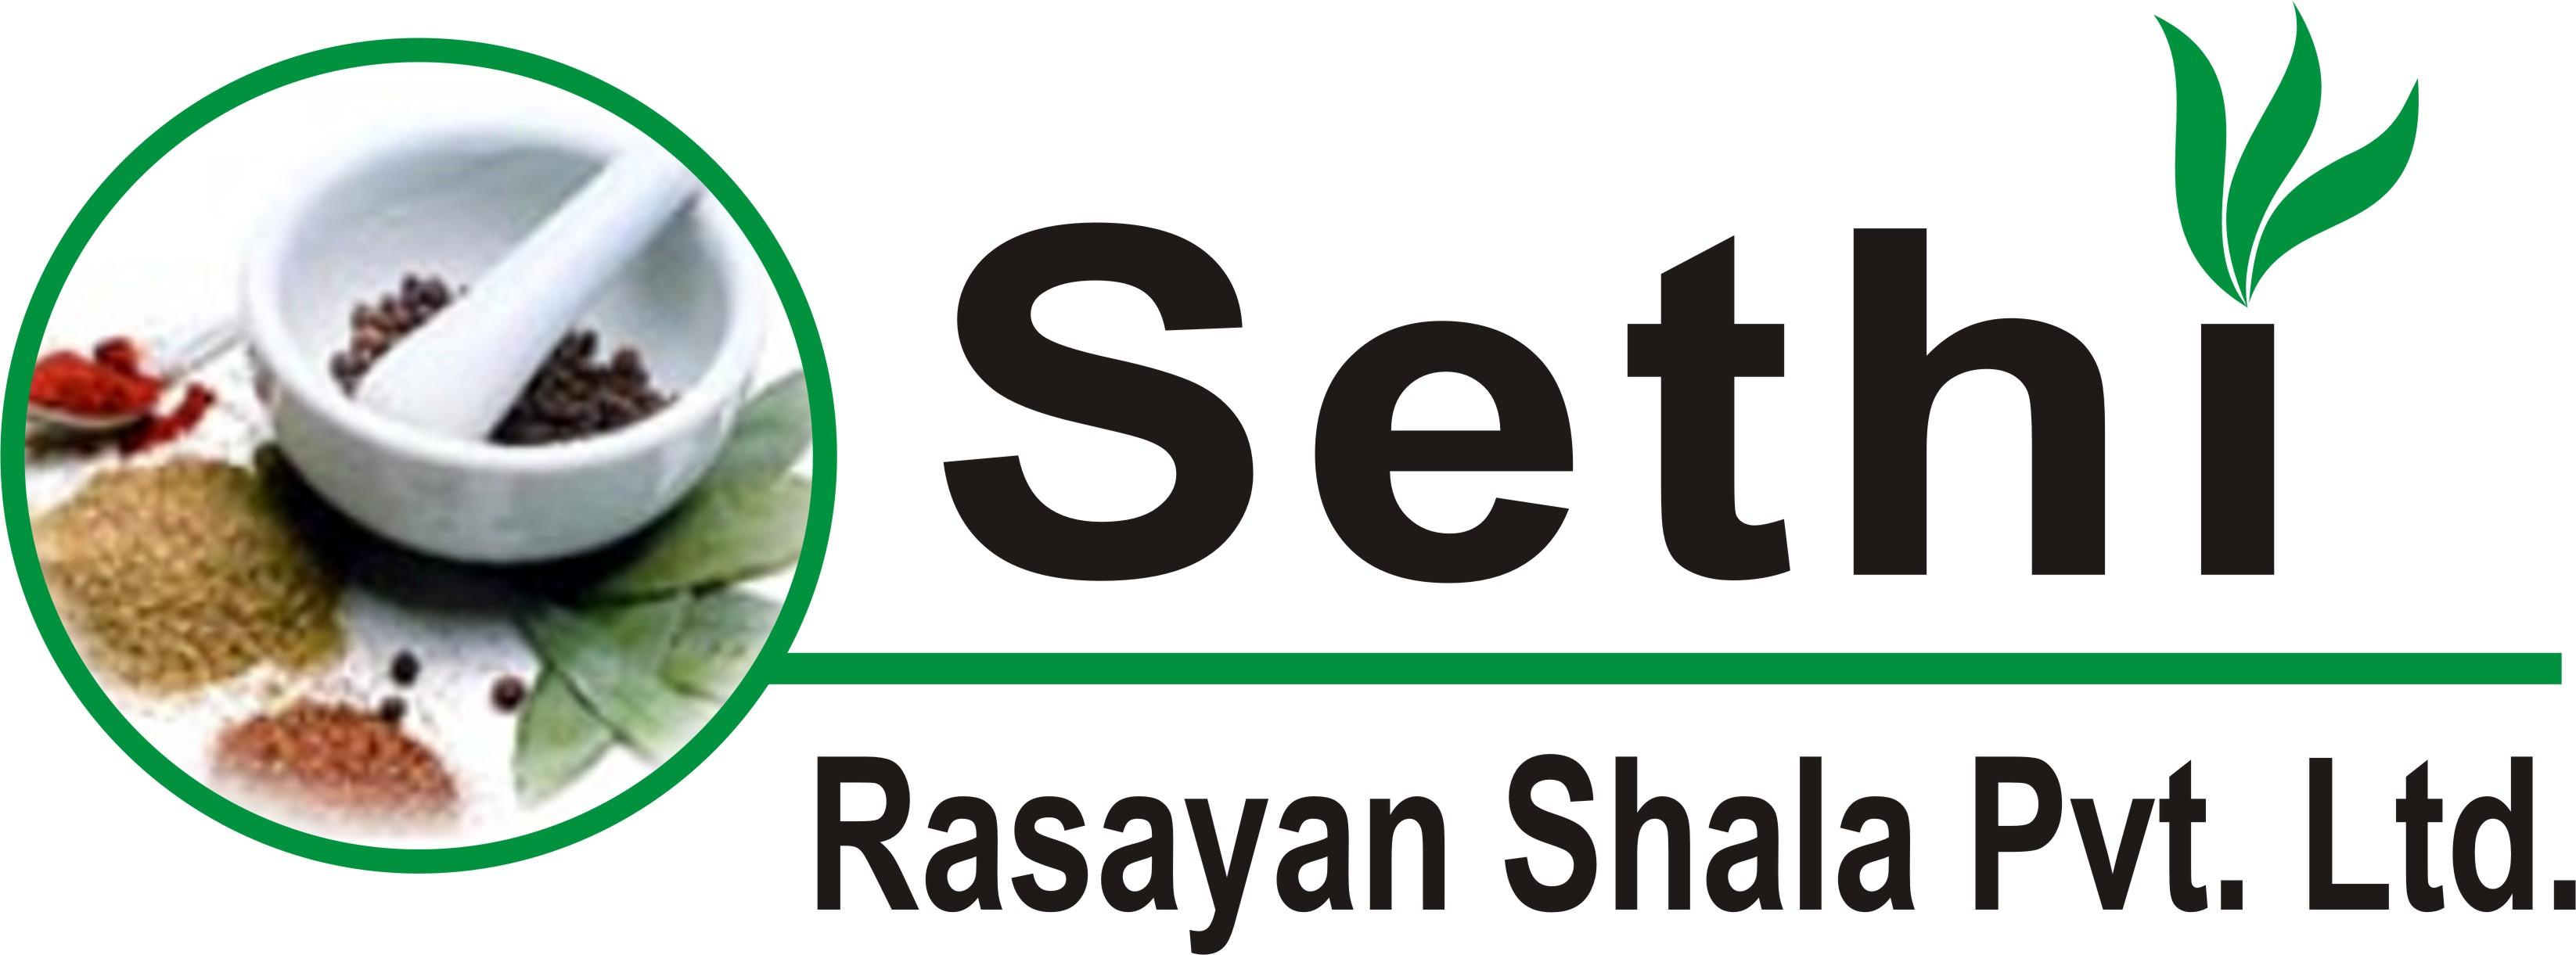 Sethi Rasayan Shala Pvt.Ltd.